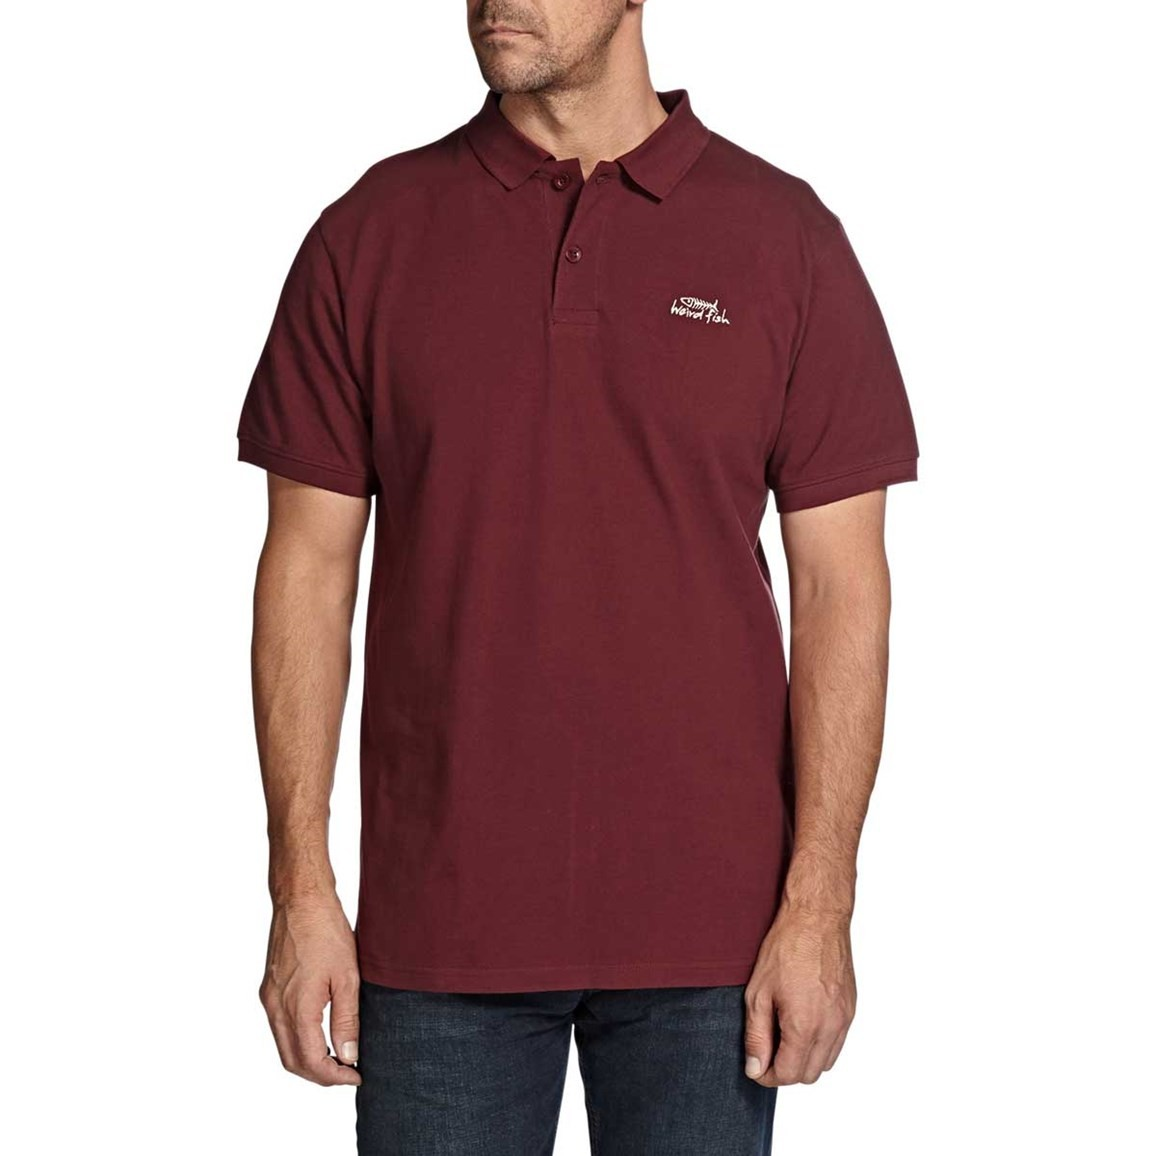 Saltash Plain Rib Collar Pique Polo Shirt Conker